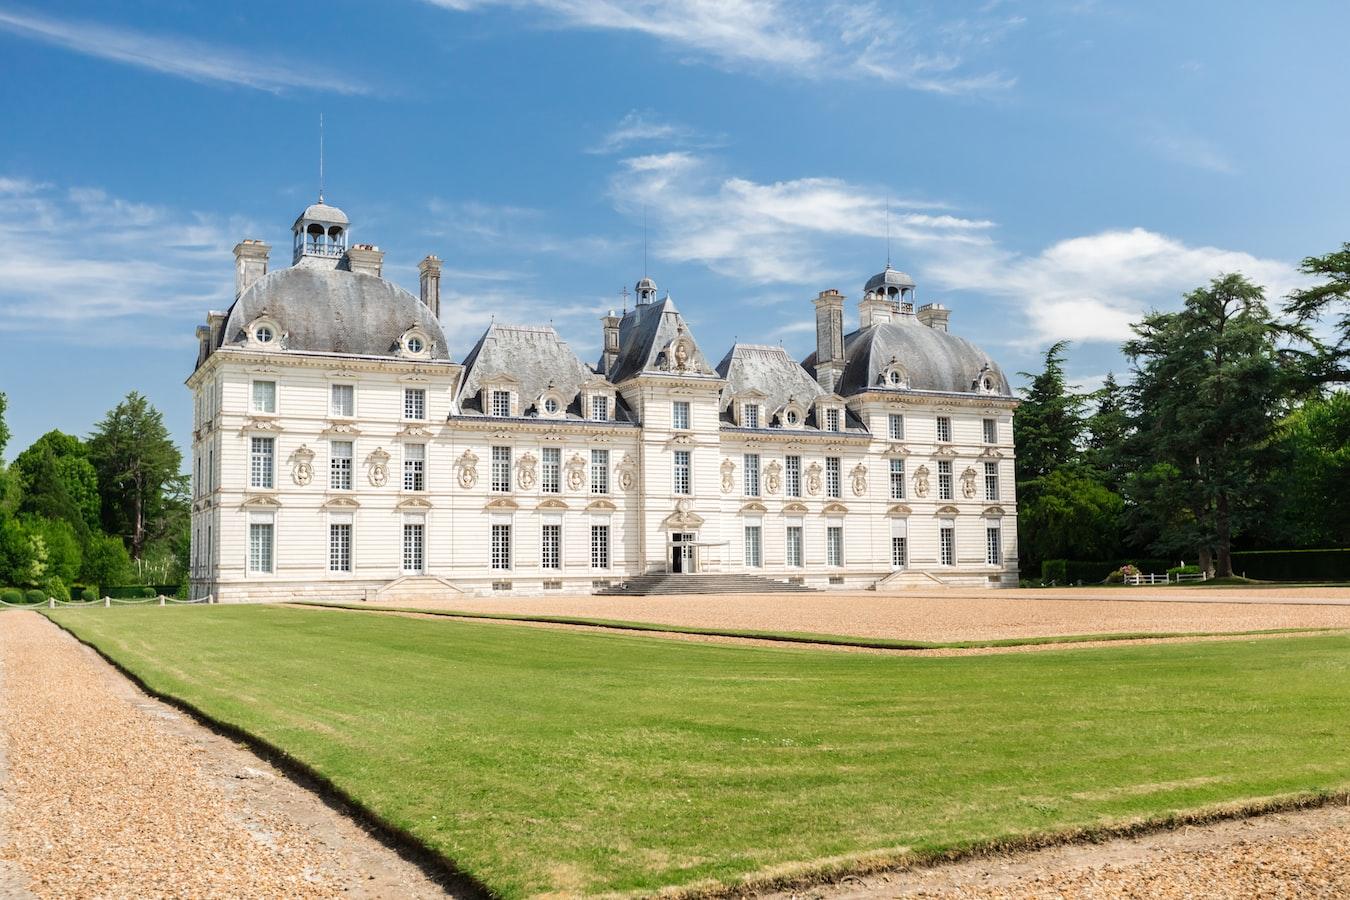 Château de Cheverny, Castles in France